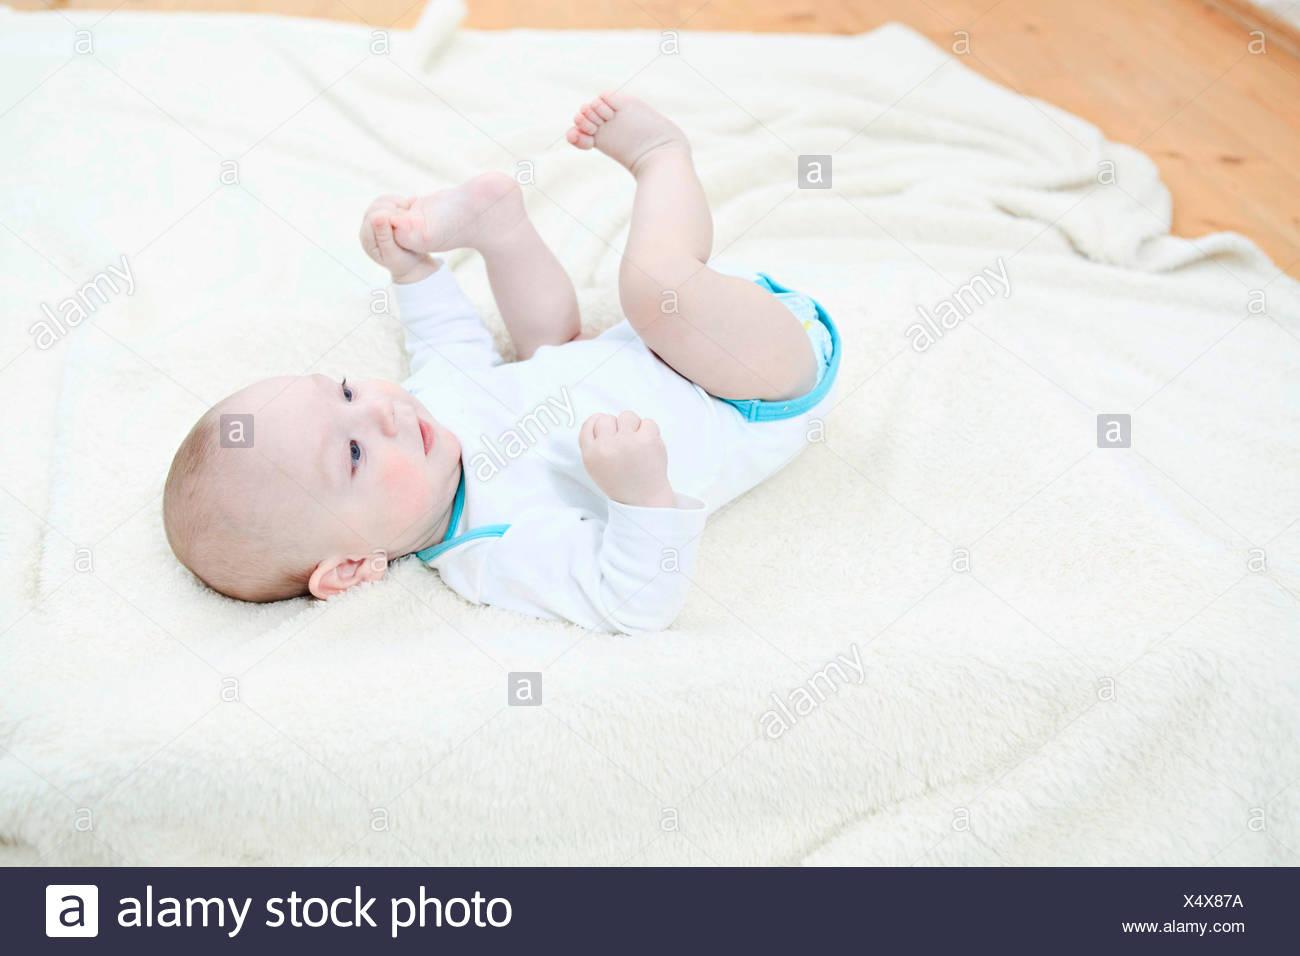 Baby boy laying on blanket - Stock Image